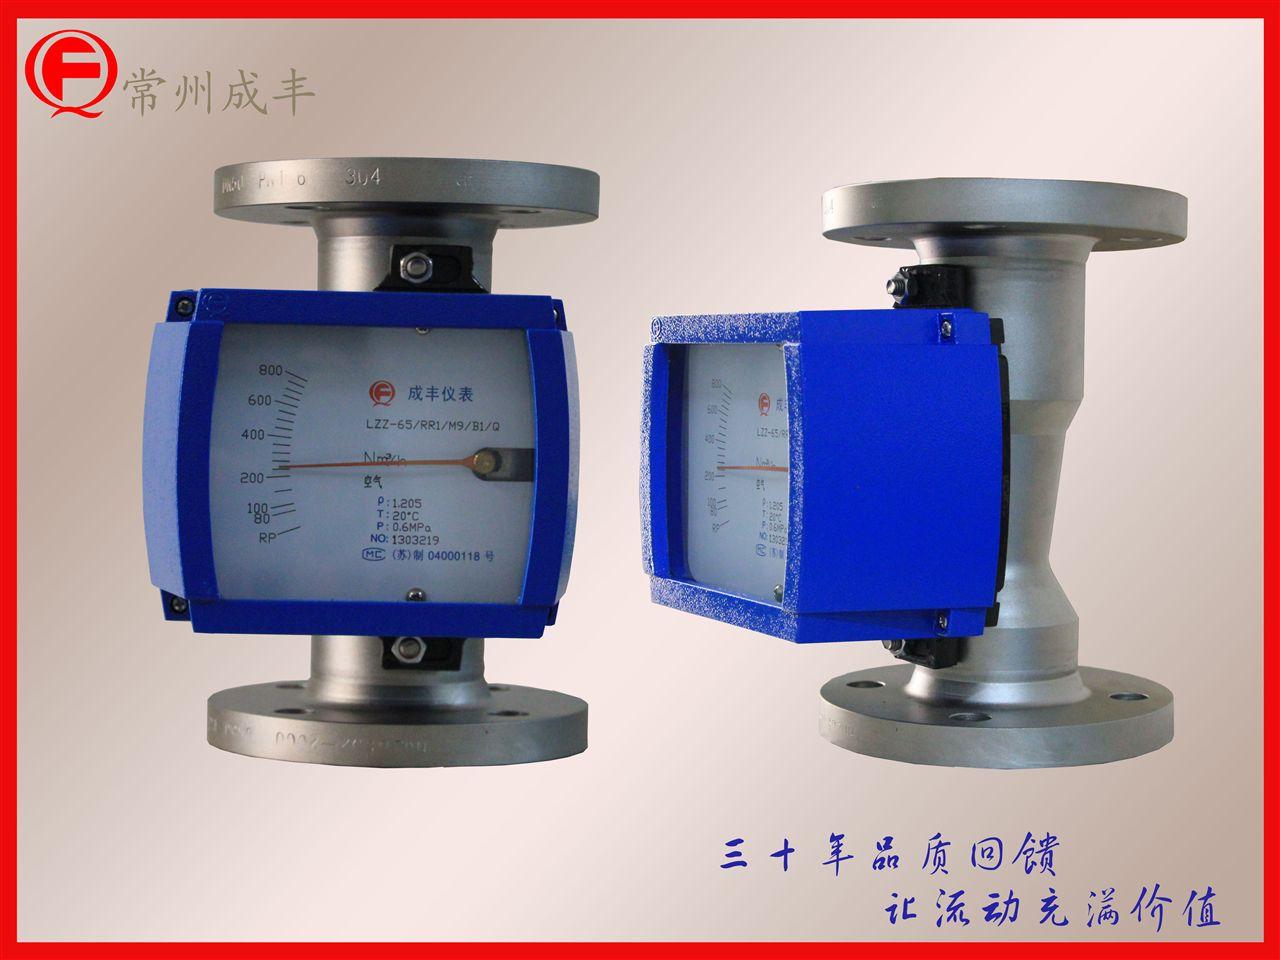 LZZ-15-【常州成豐】第三代金屬管浮子流量計,國產質量品種Z全,服務Z優。